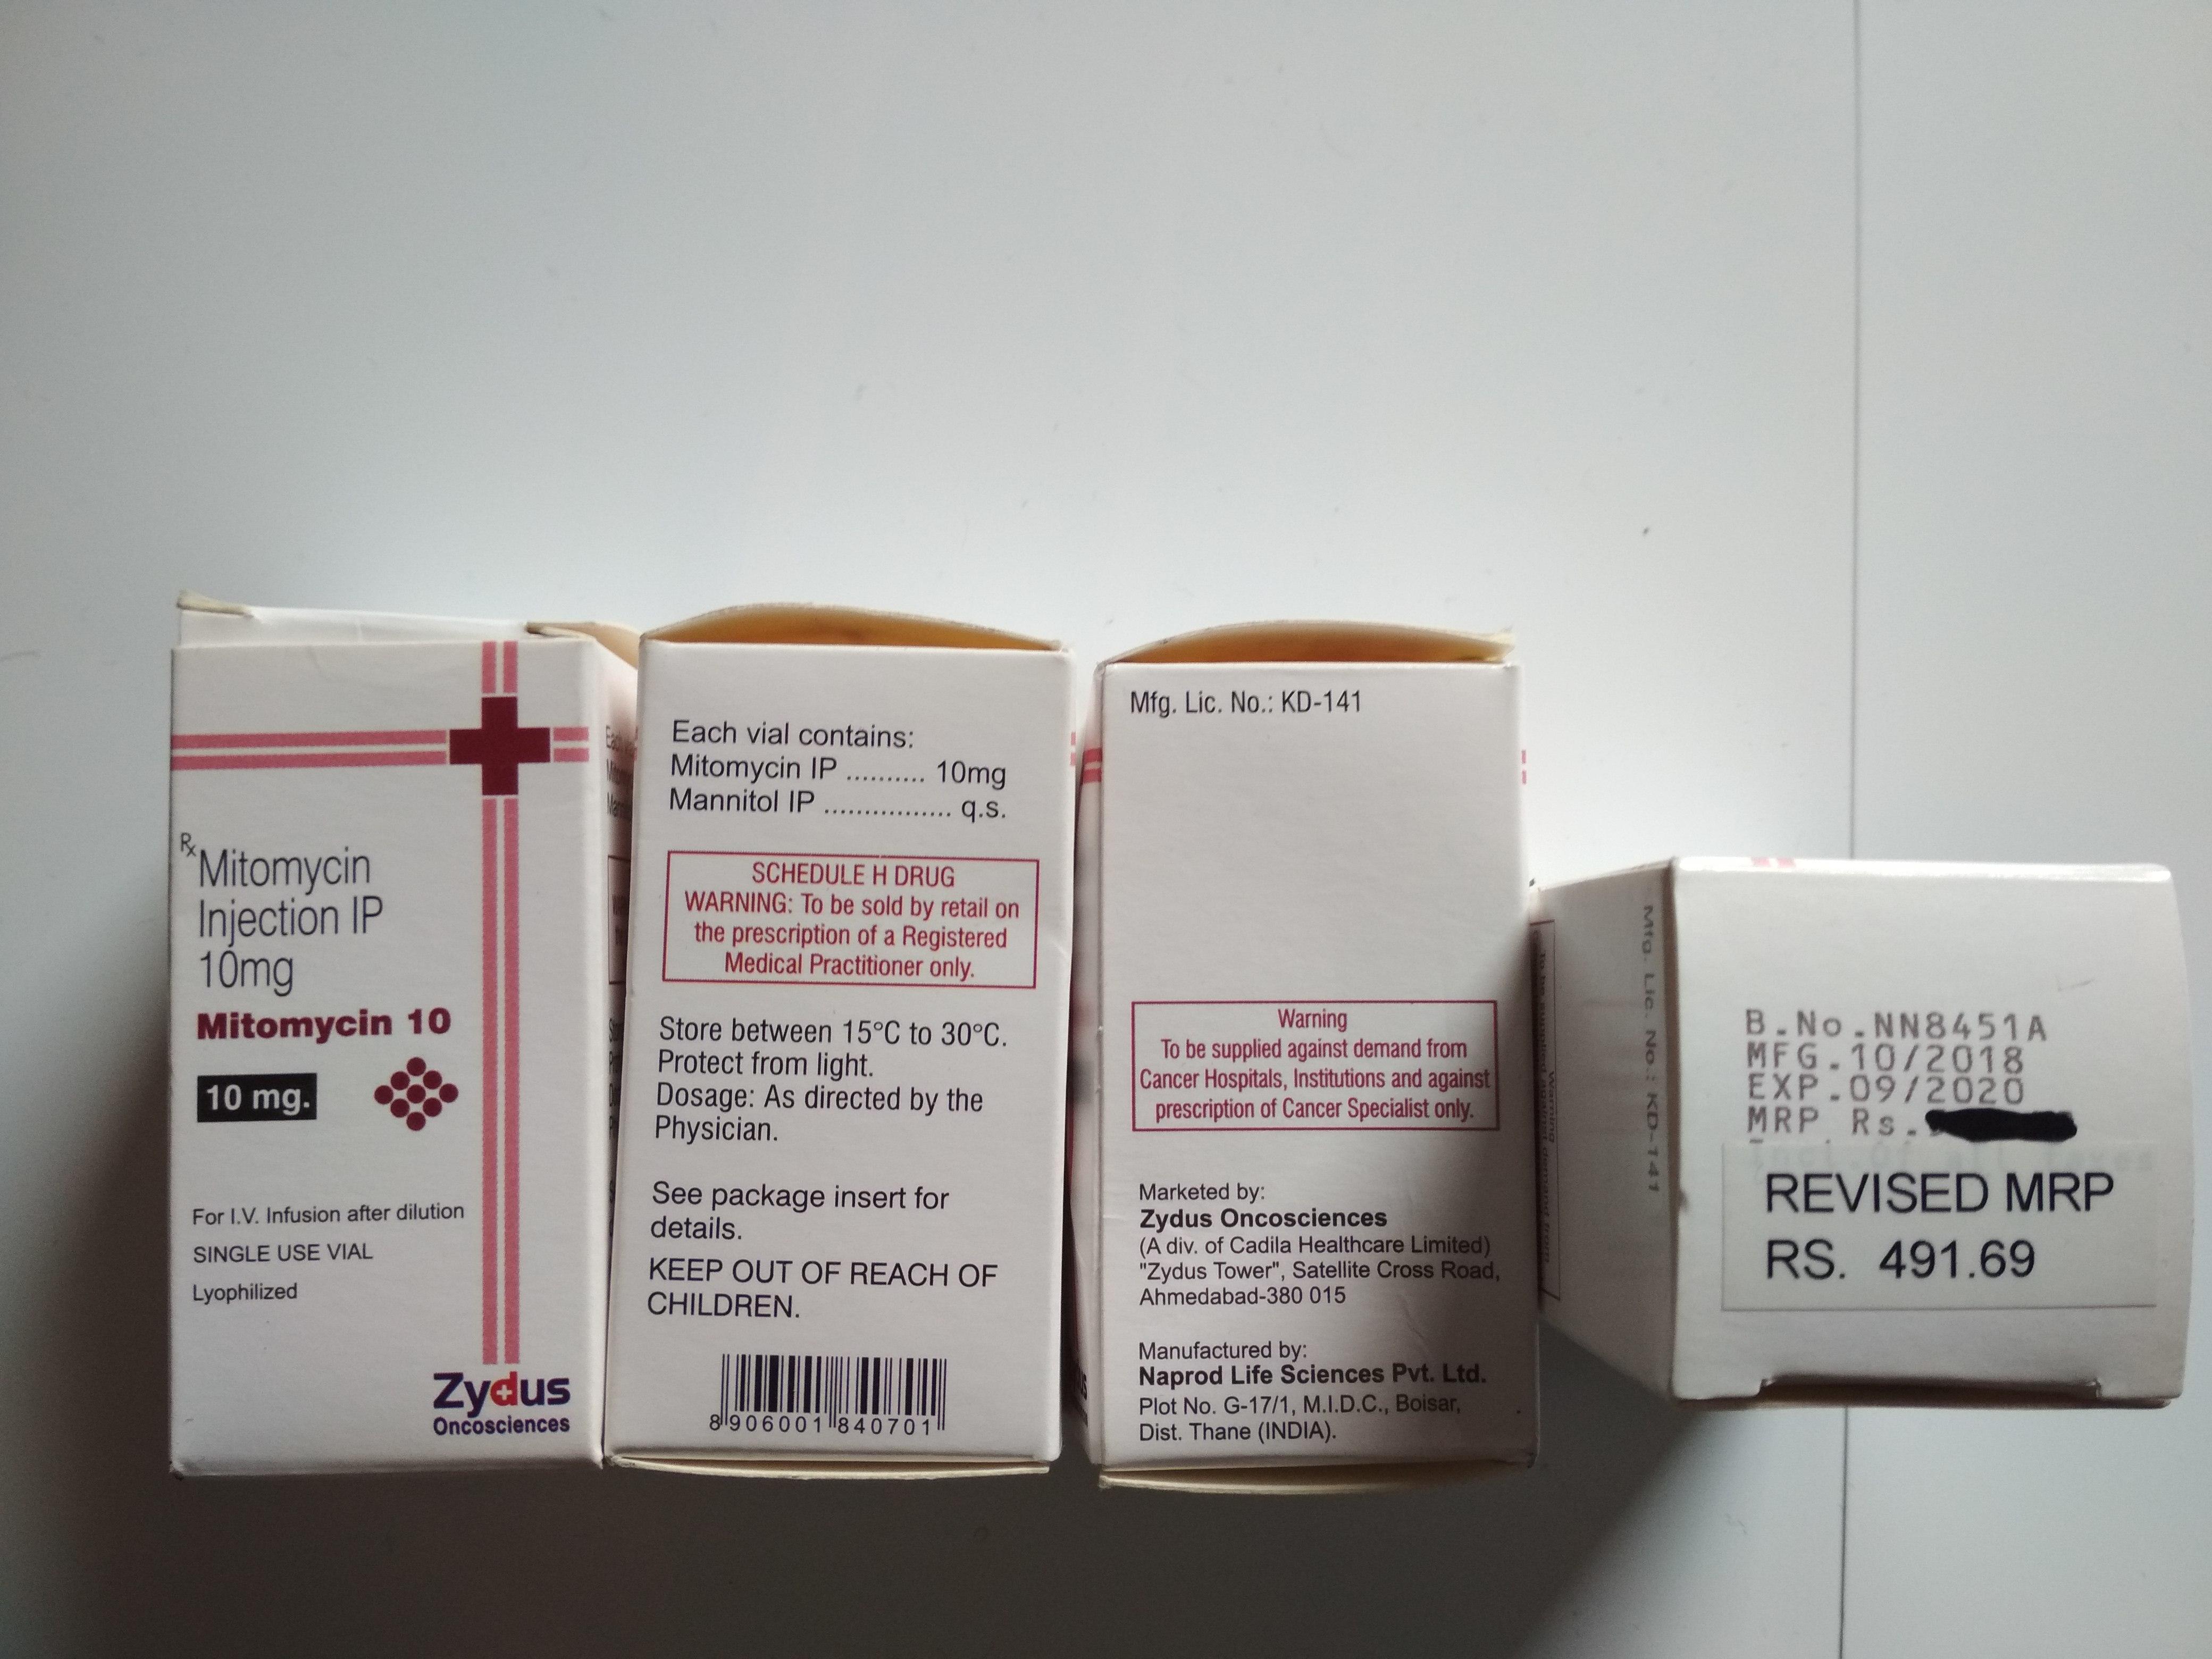 Mitomycin 10 Mg Injection